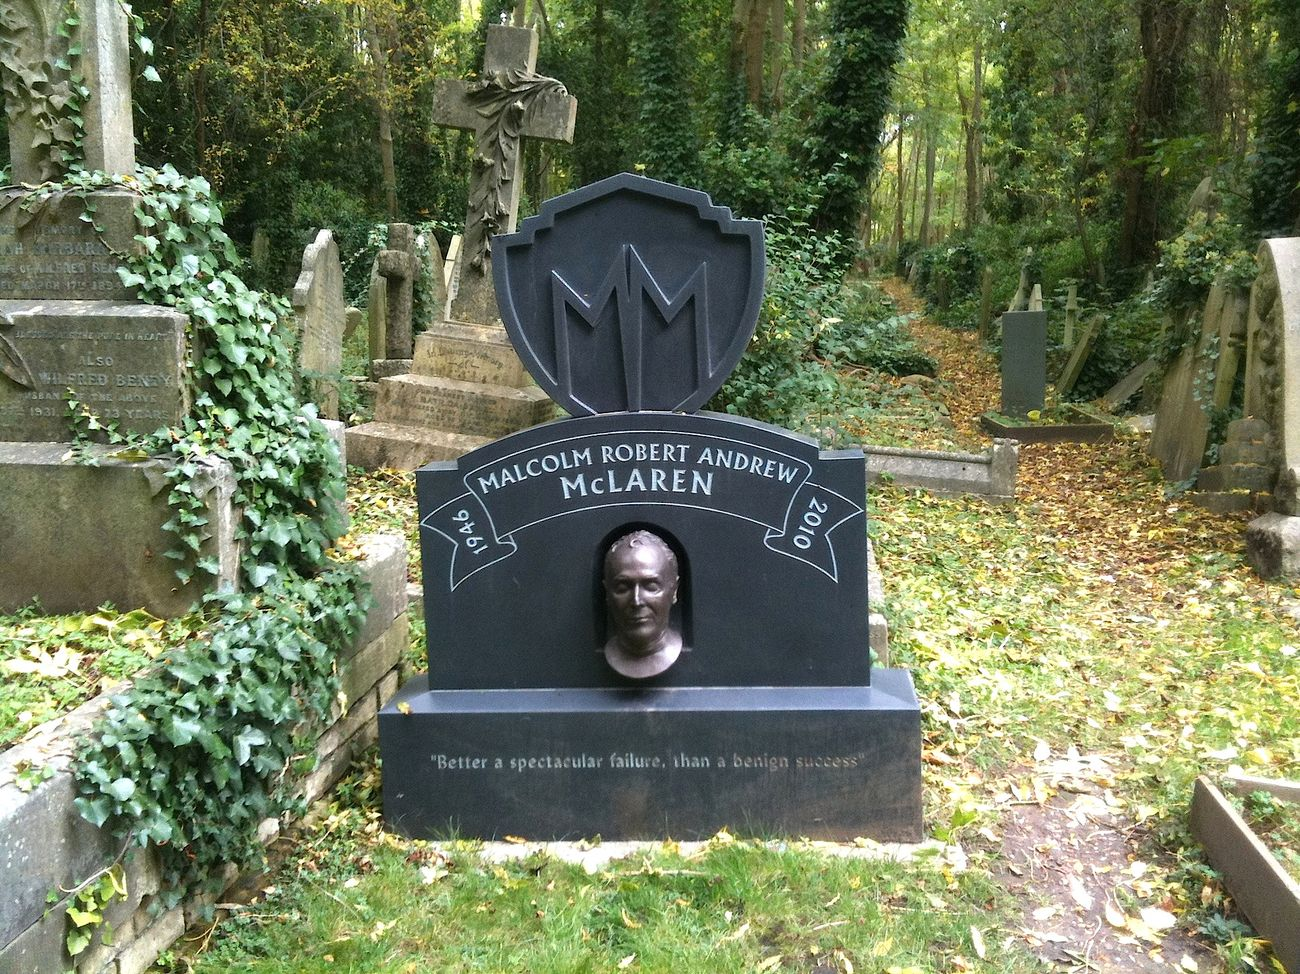 Highate Gardens, Londra. La Tomba di Jim Stnford Horn. Photo Claudia Zanfi